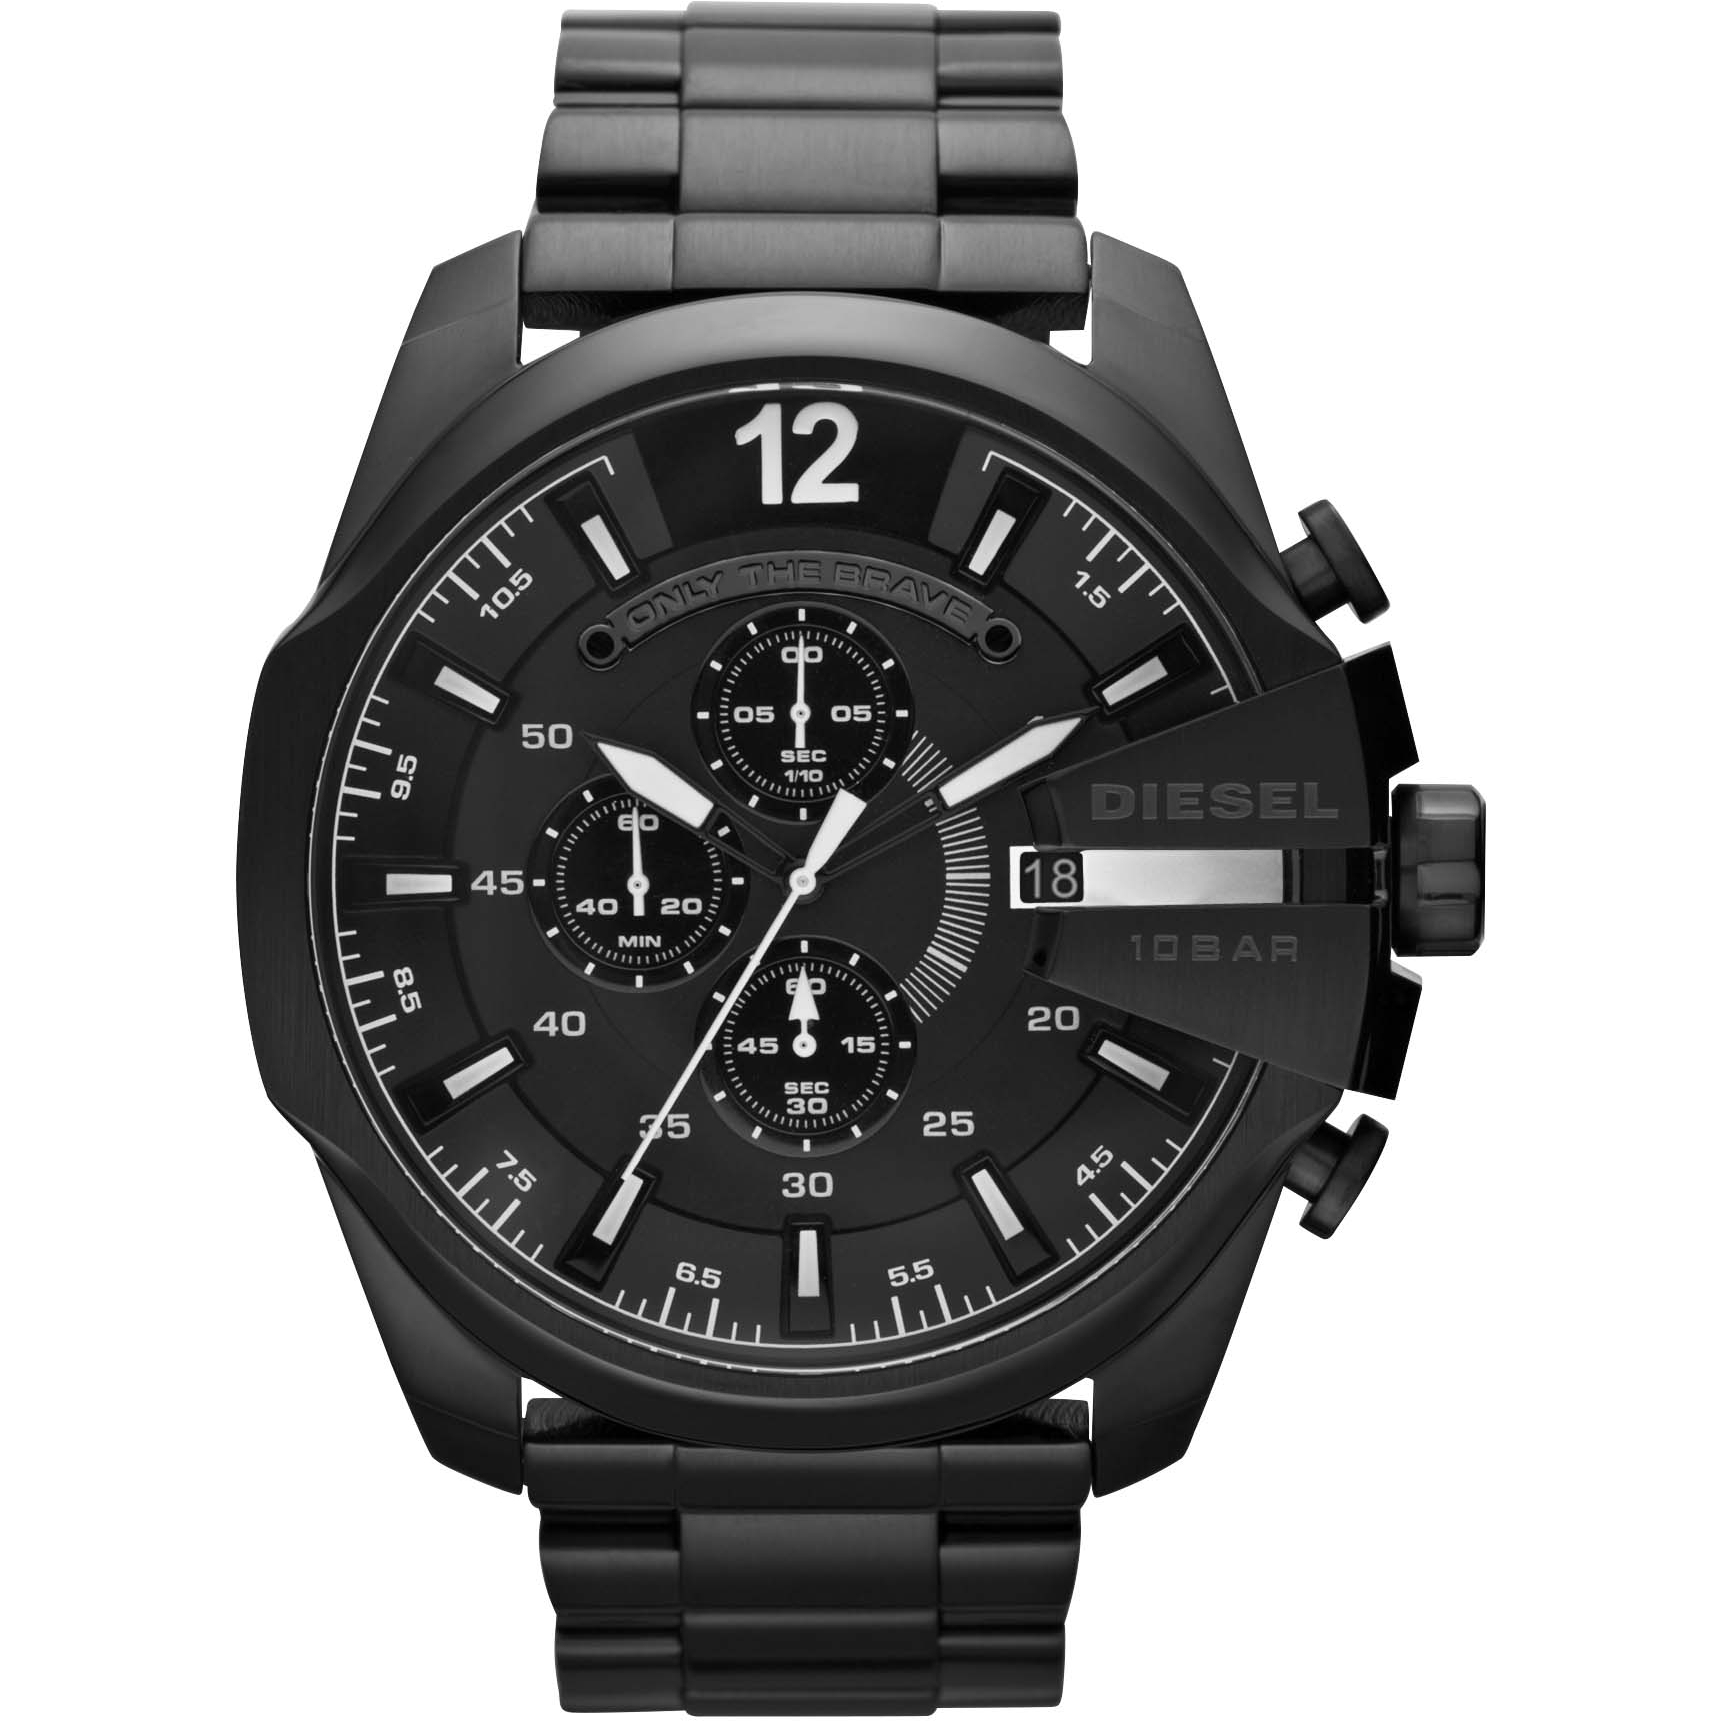 8737007bbf5 Gents Diesel Mega Chief Chronograph Watch (DZ4283)